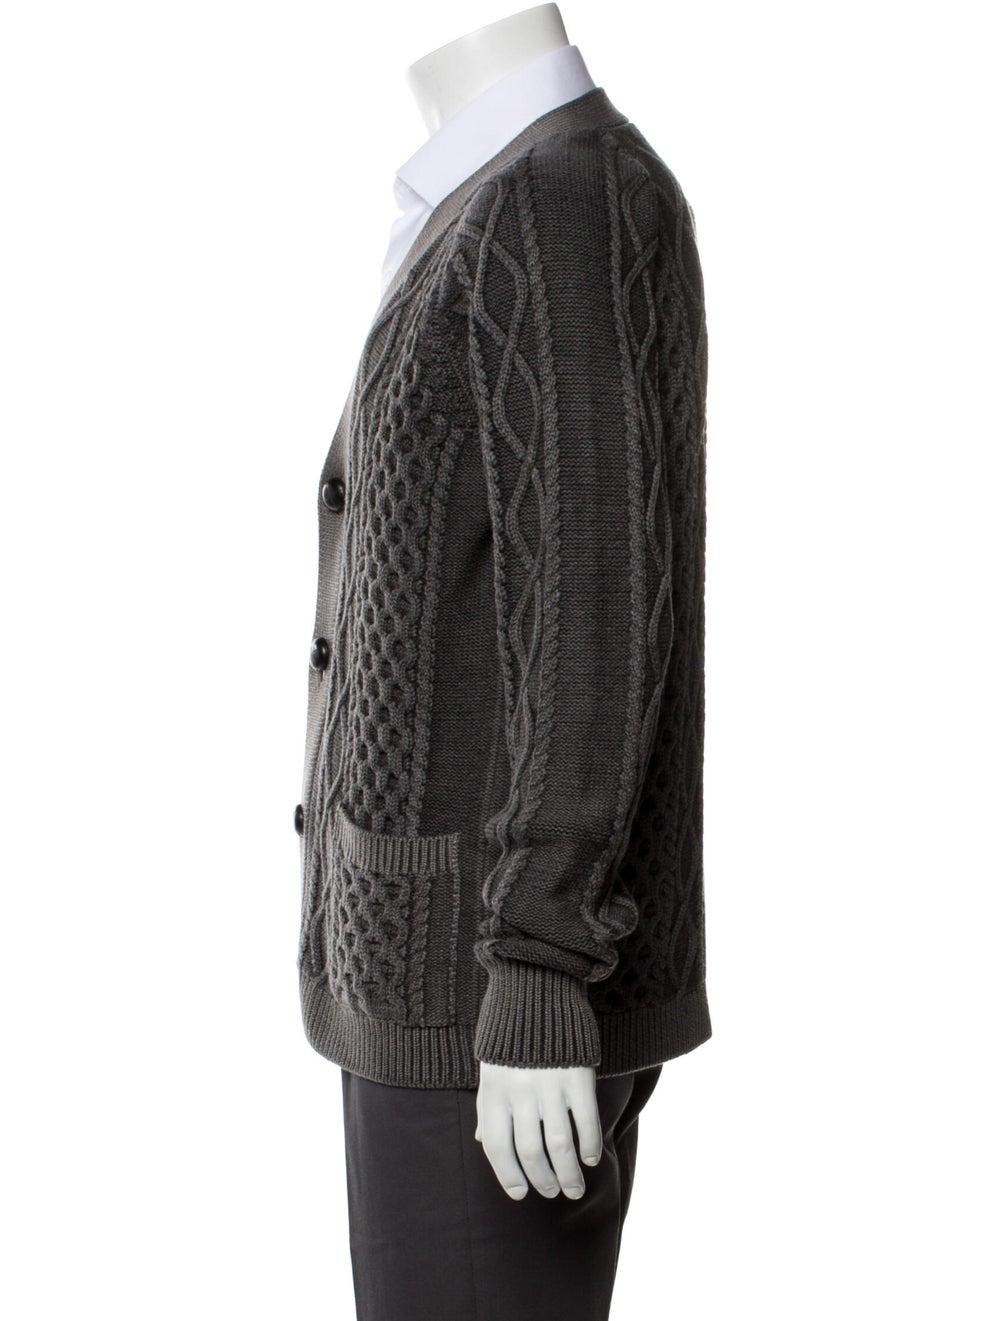 Prada Wool Printed Cardigan Wool - image 2